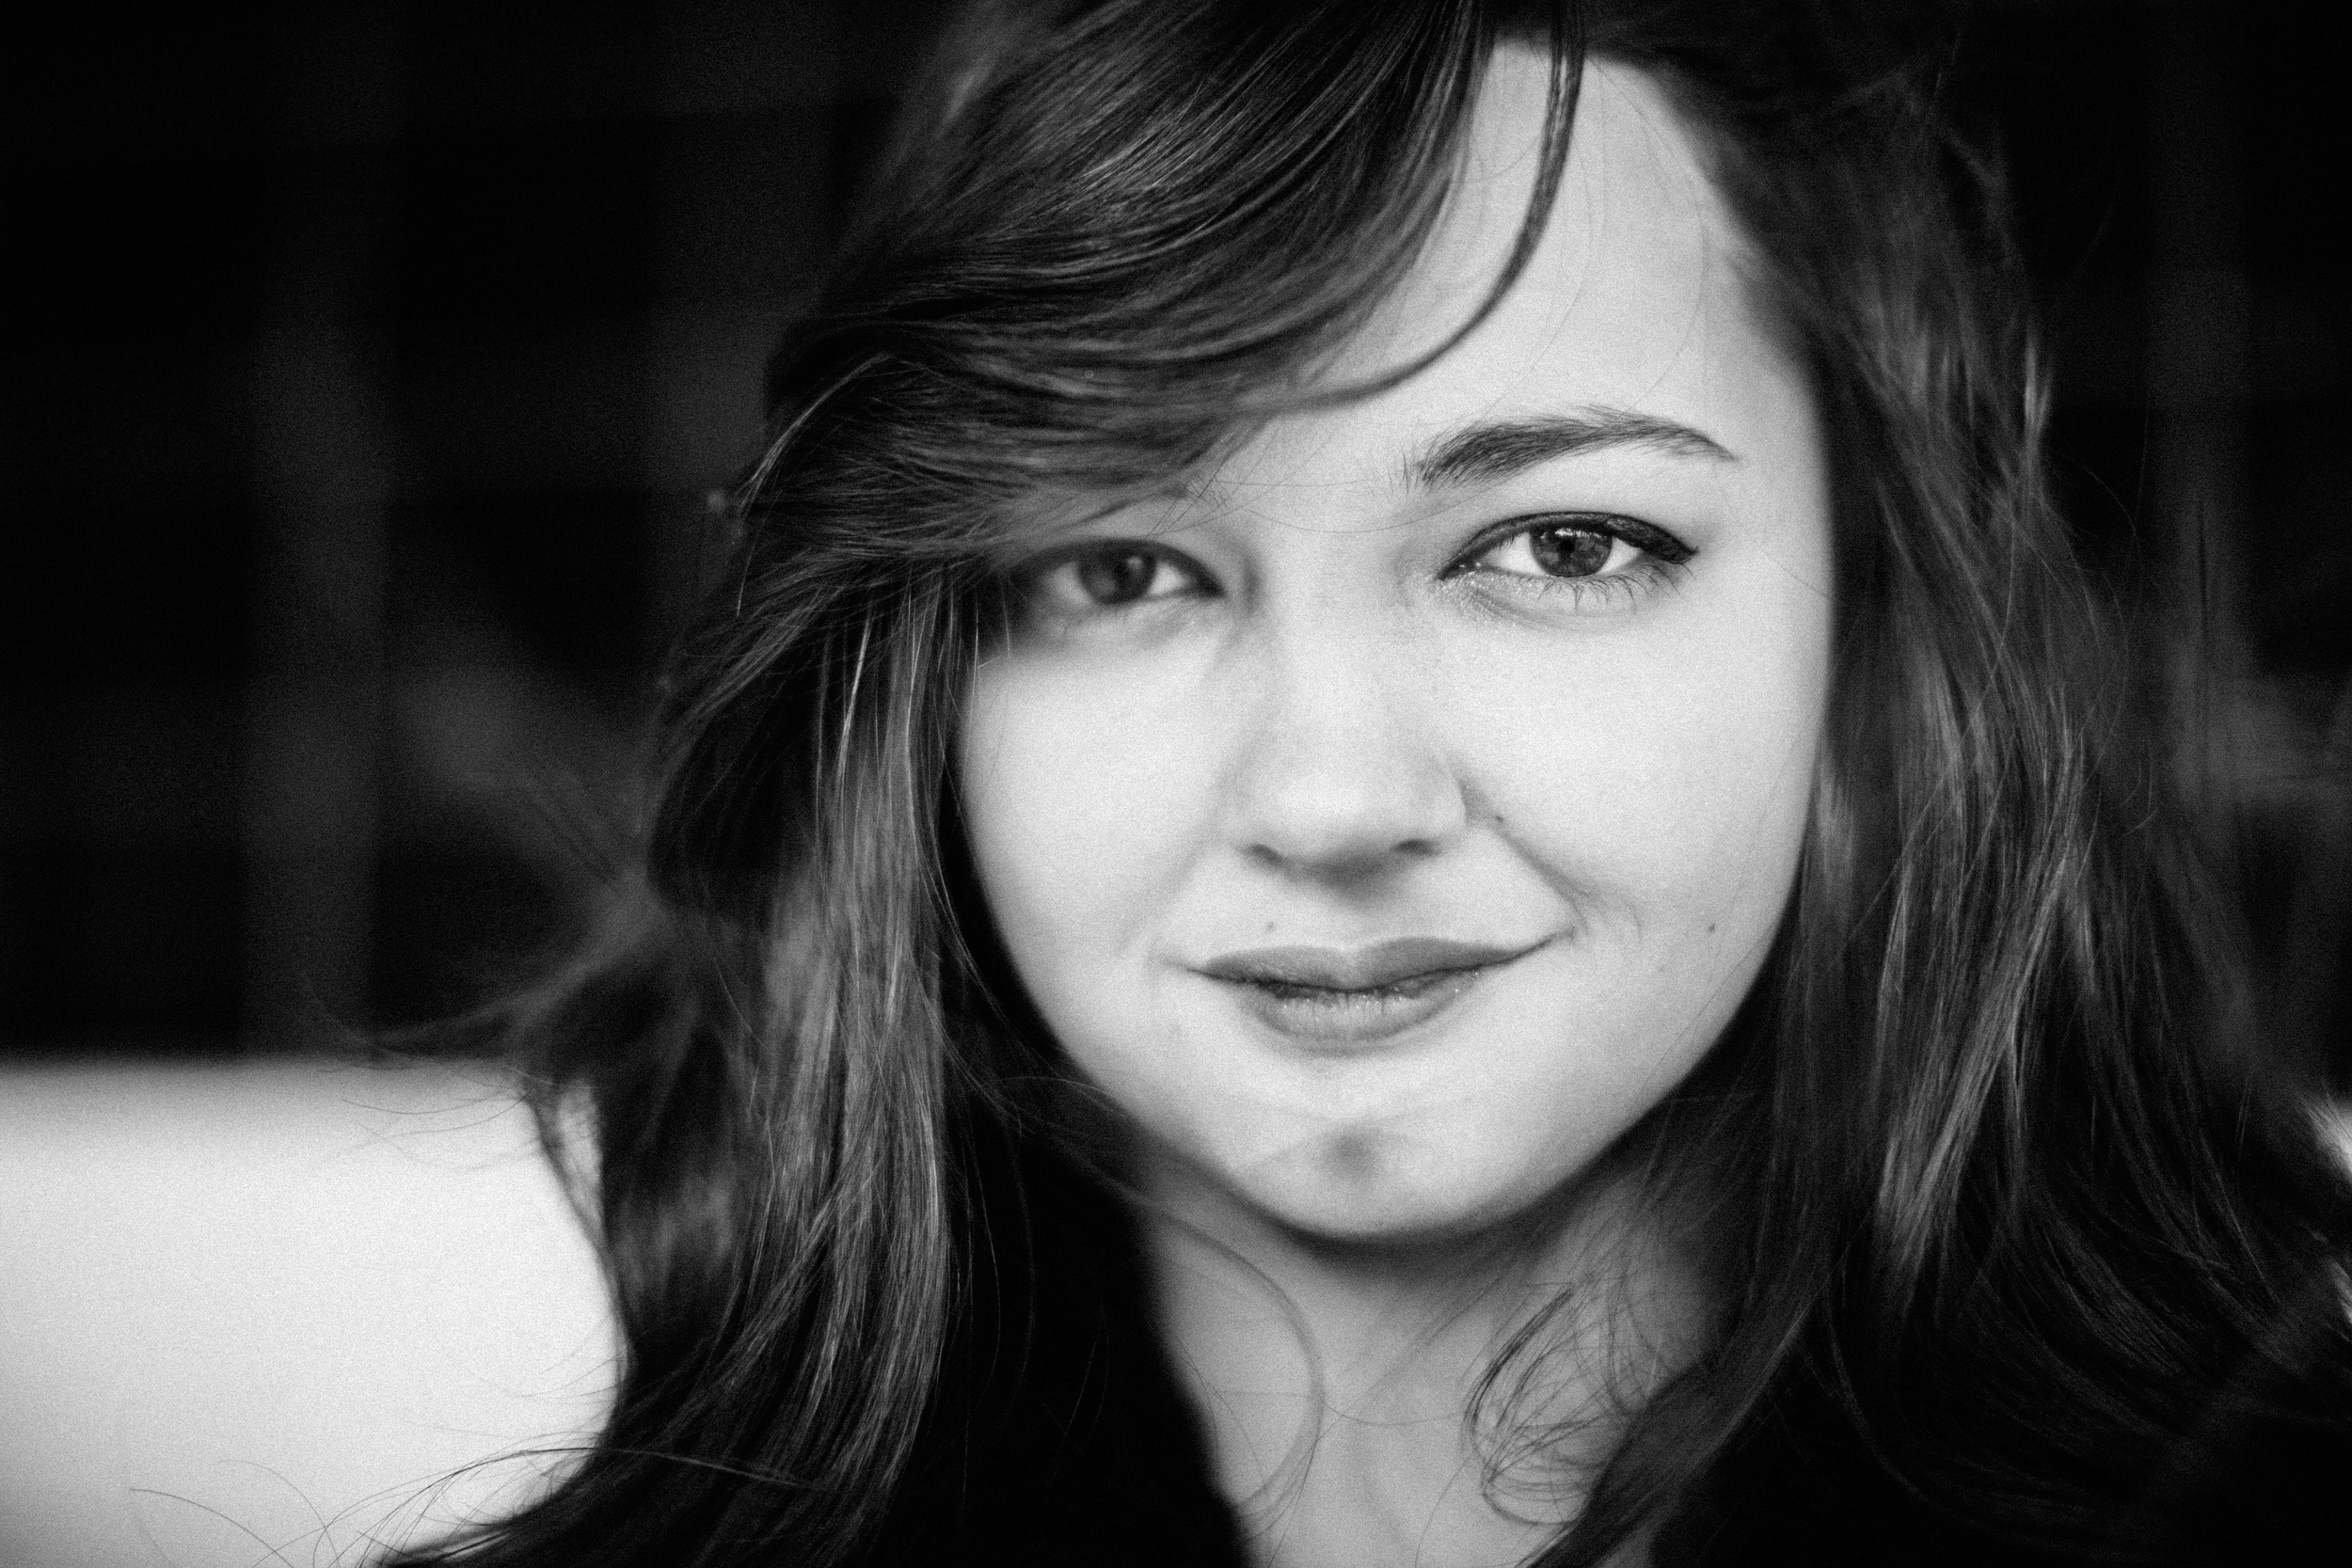 Catherine-Senior-Portraits-0400.jpg